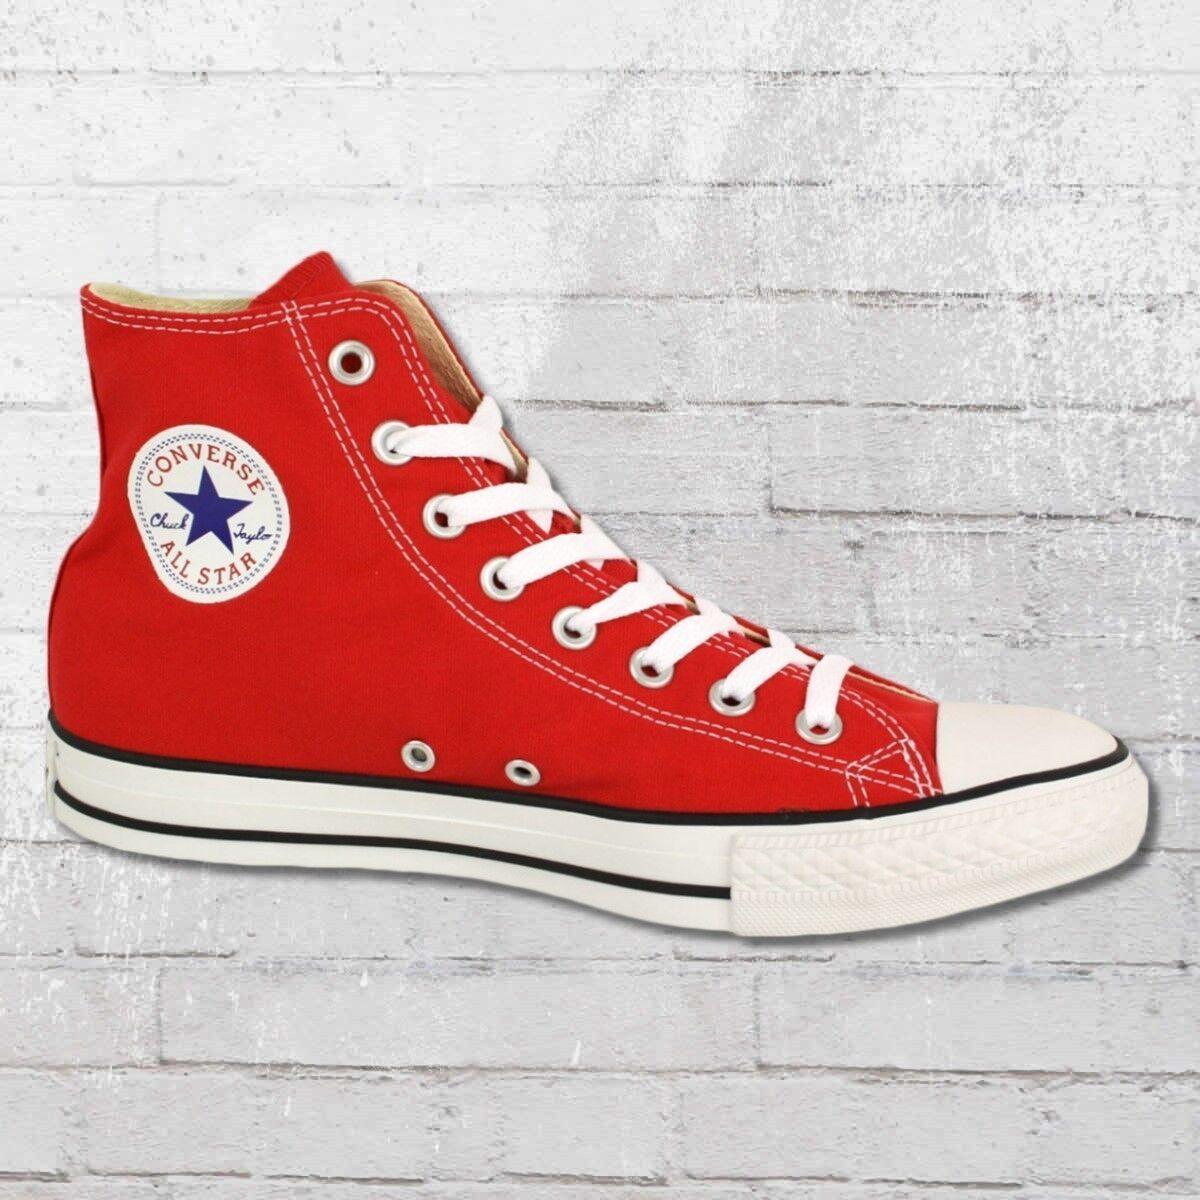 Converse Sneaker Chucks CT AS Hi M9621 C Schuhe red All Star Schuhe rot